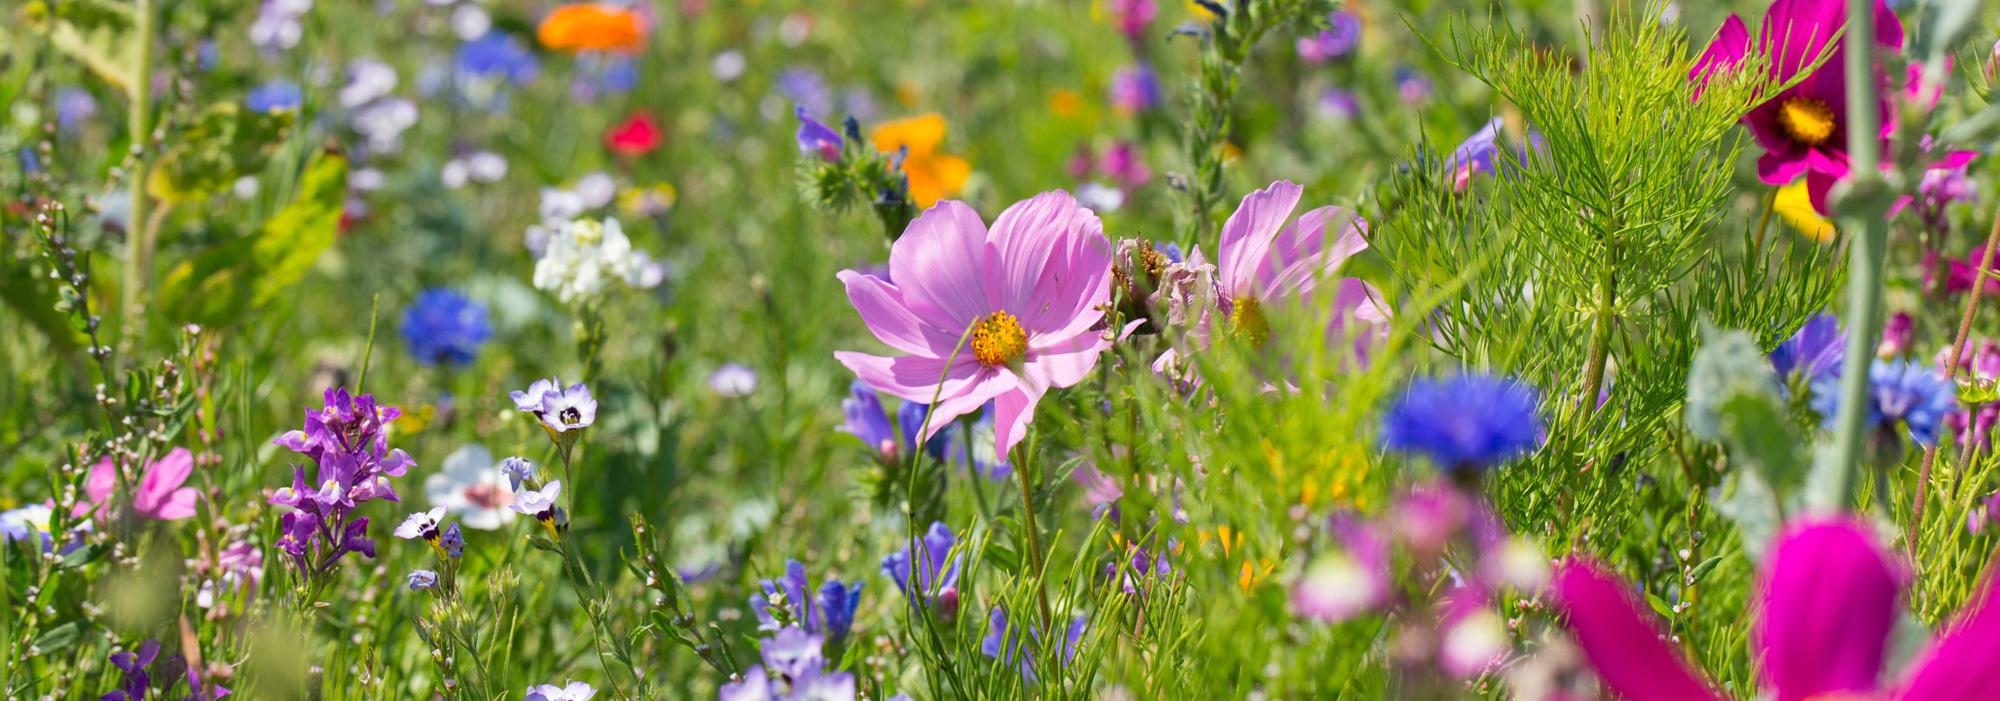 Blühwiese auf dem Gut Wulksfelde